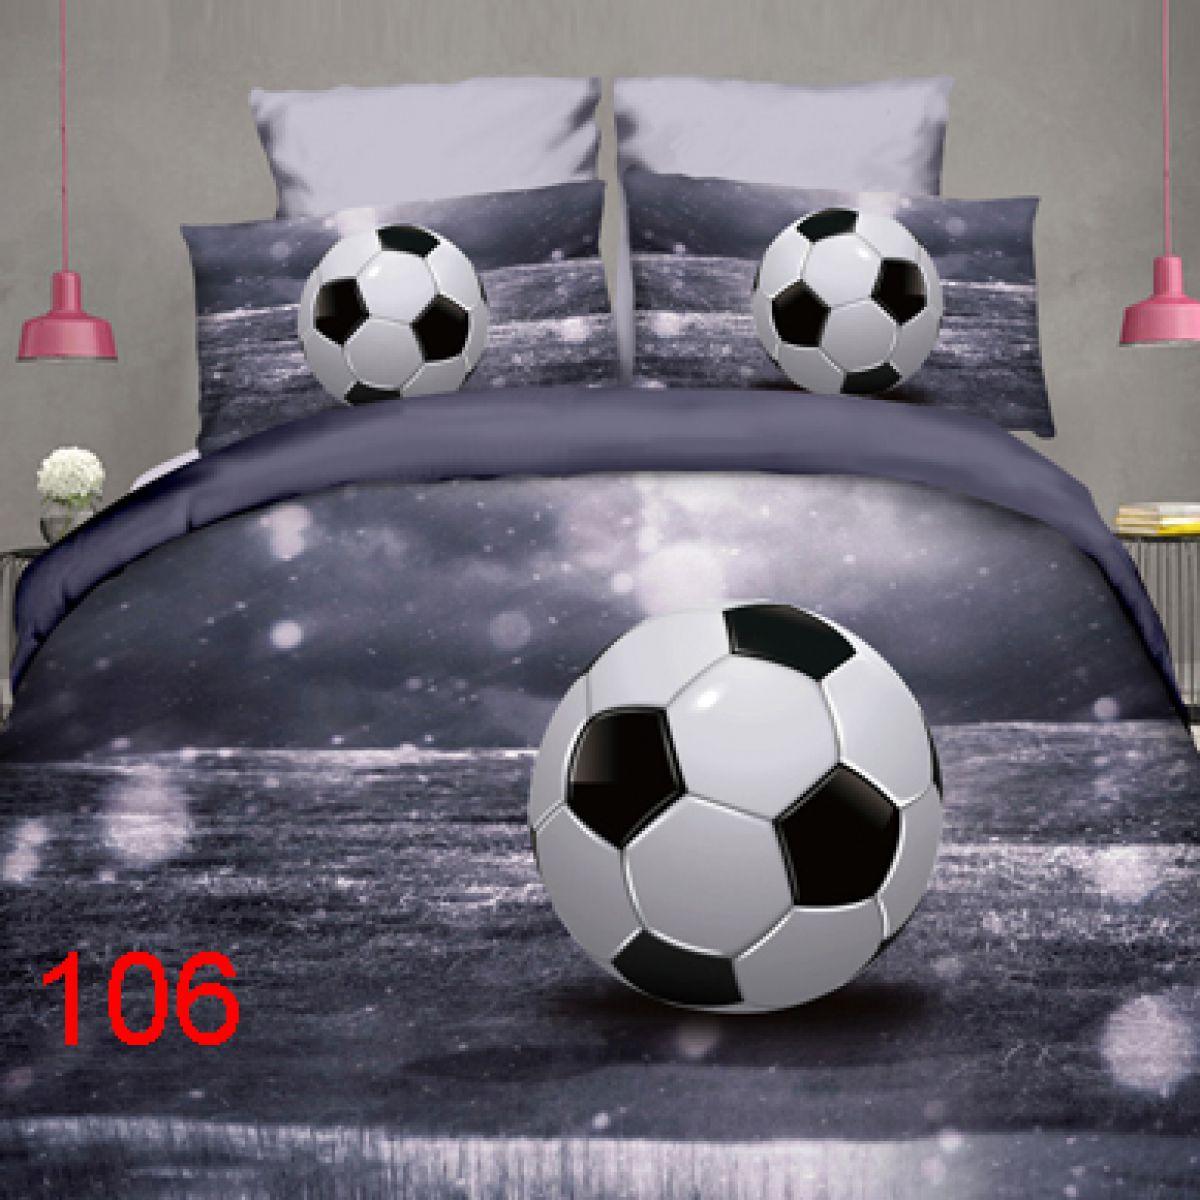 3D Beddings - Antonio - AML-106 - 160x200 cm - 4 pcs